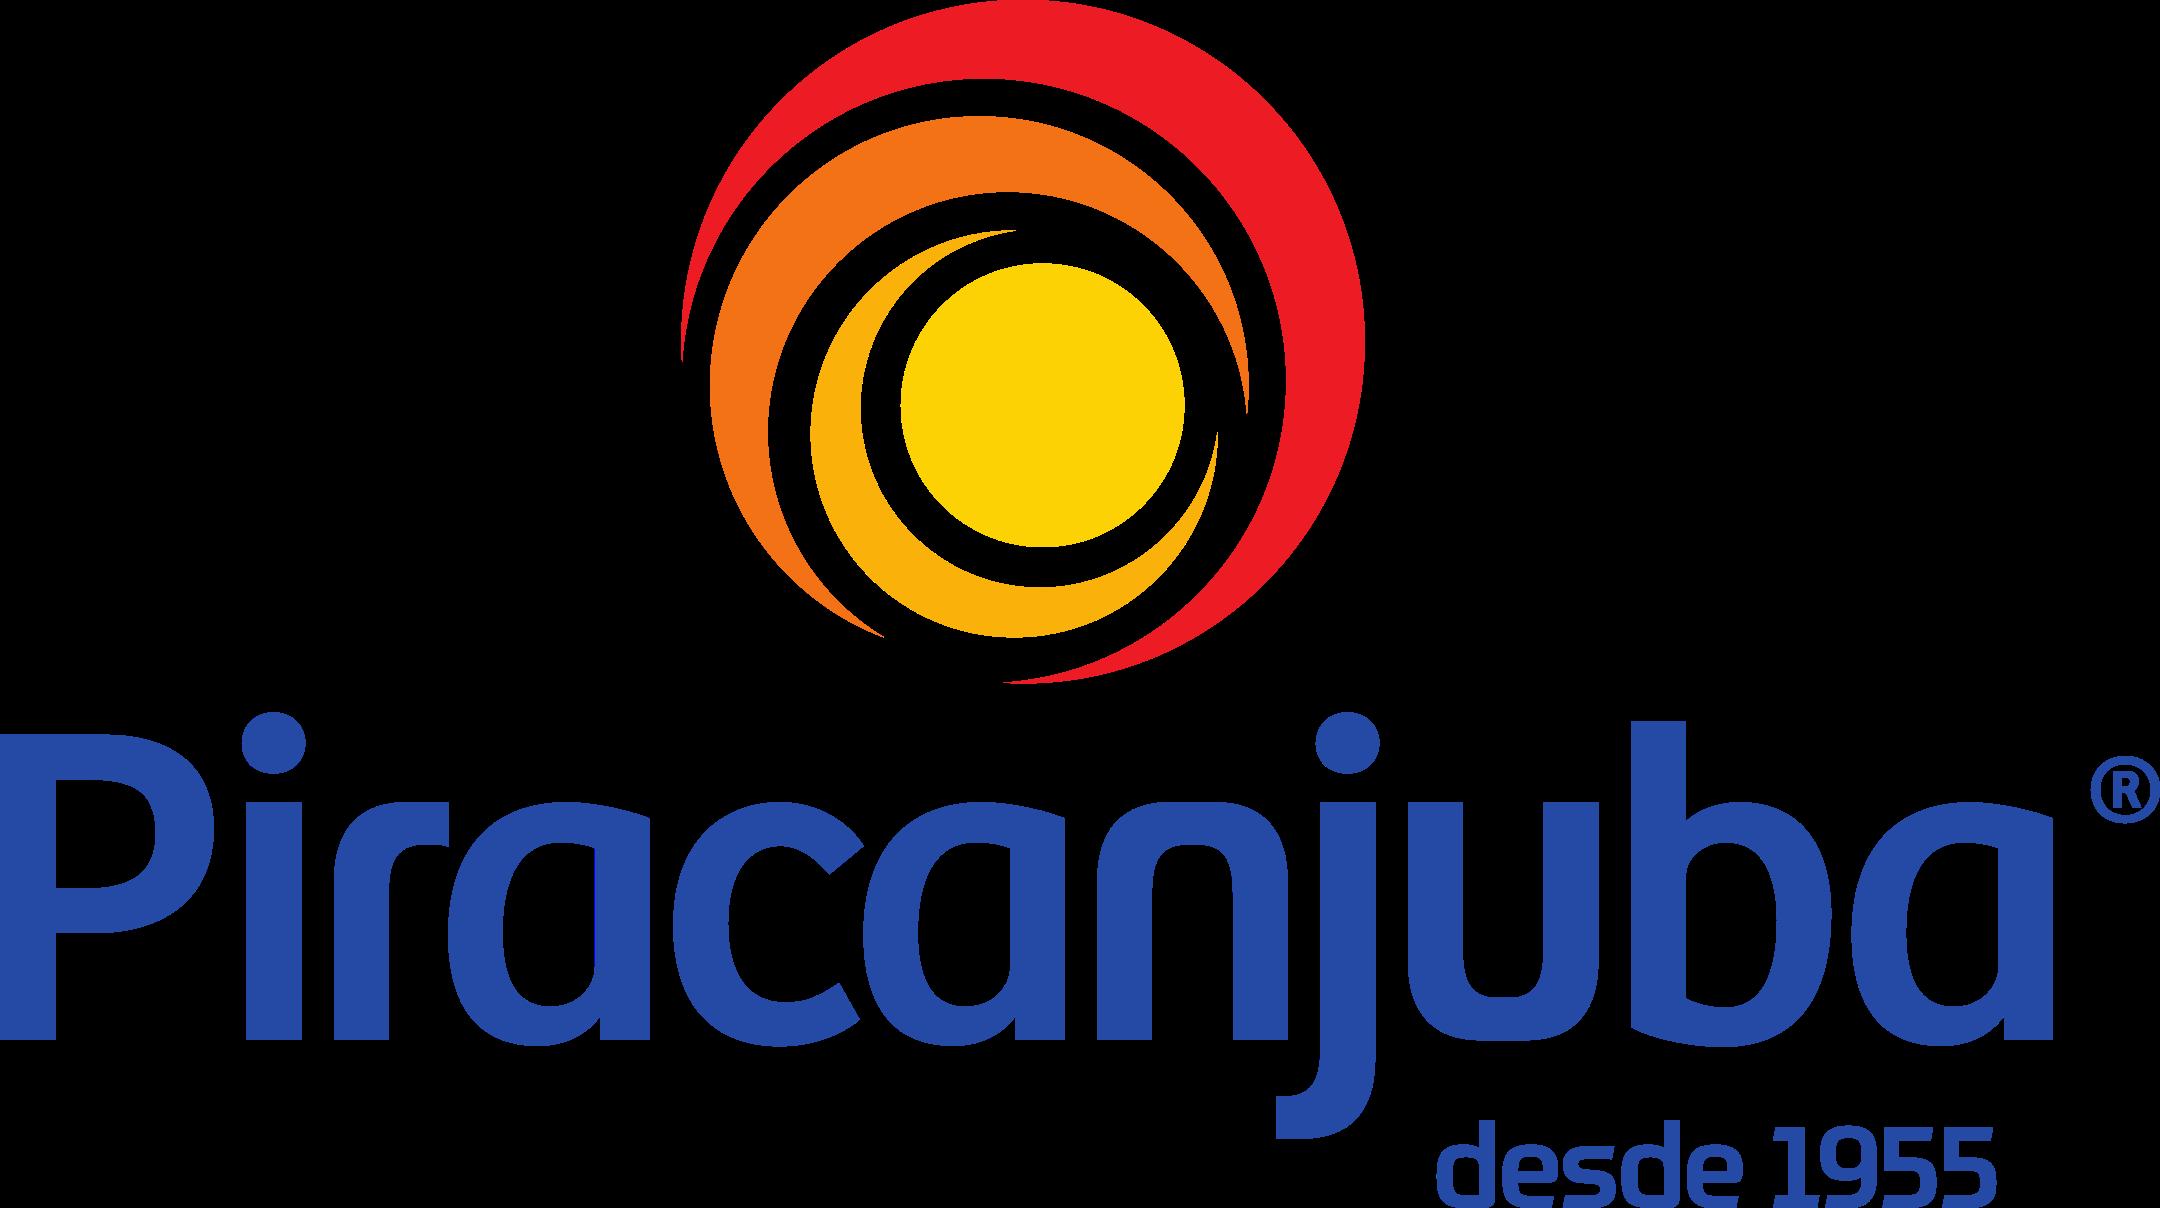 piracanjuba logo 1 - Piracanjuba Logo